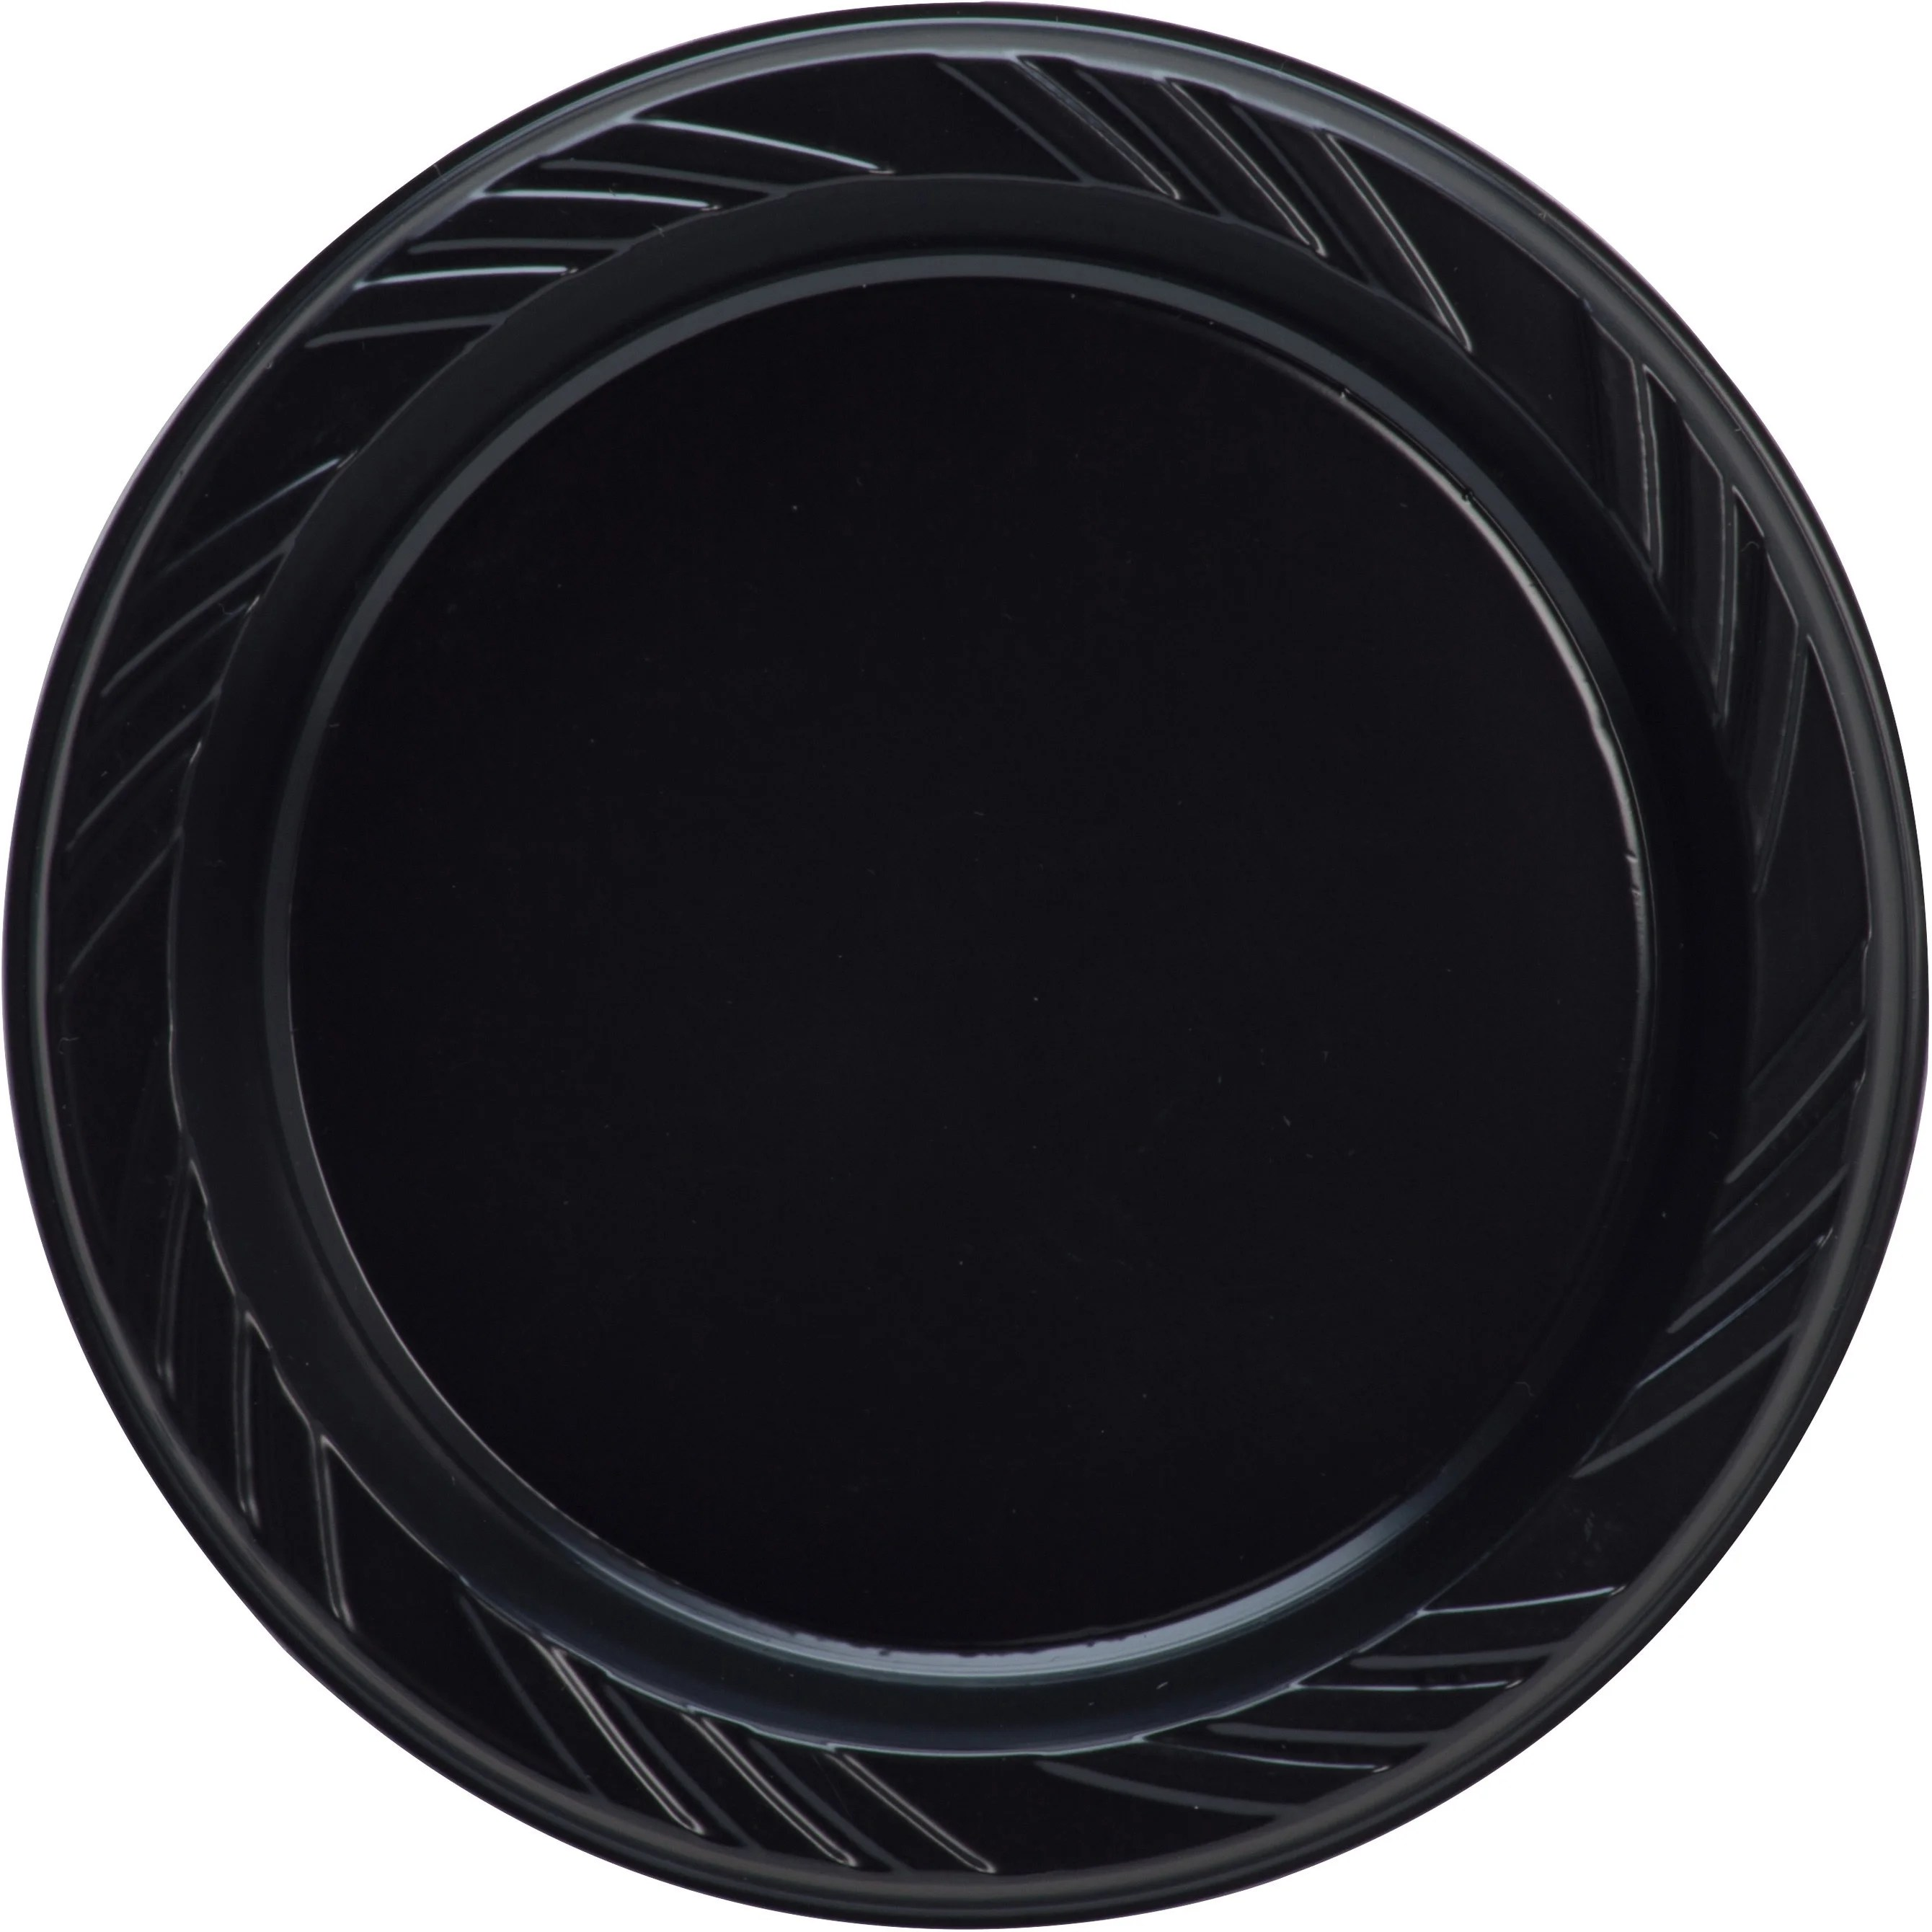 Genuine Joe Round Plastic Plates